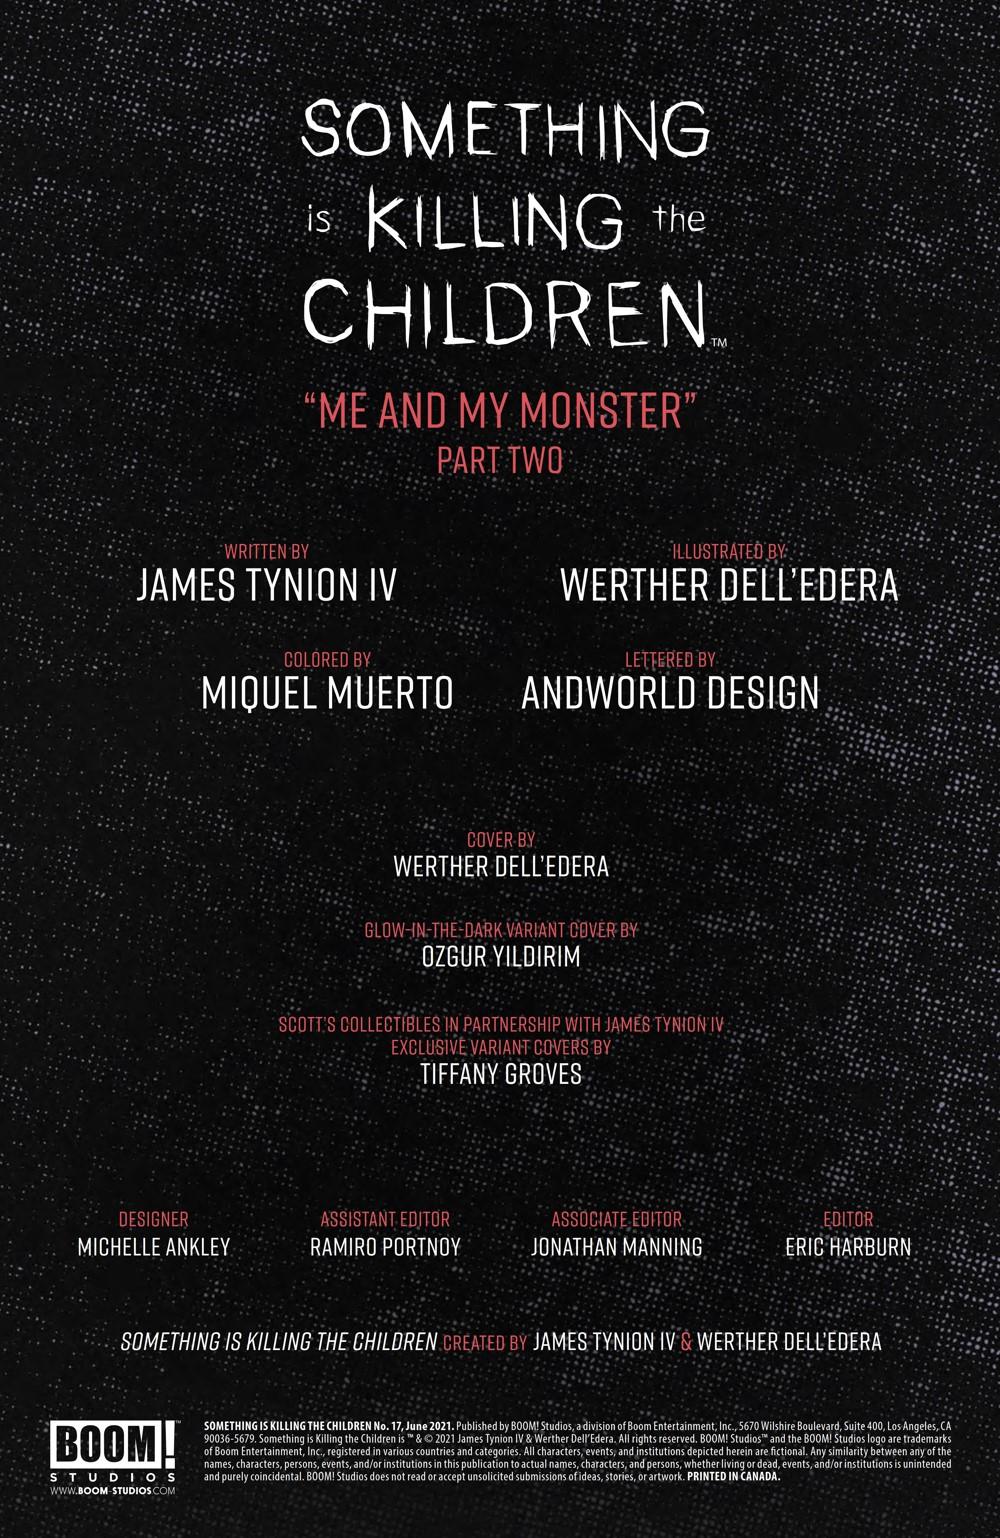 SomethingKillingChildren_017_PRESS_21 ComicList Previews: SOMETHING IS KILLING THE CHILDREN #17